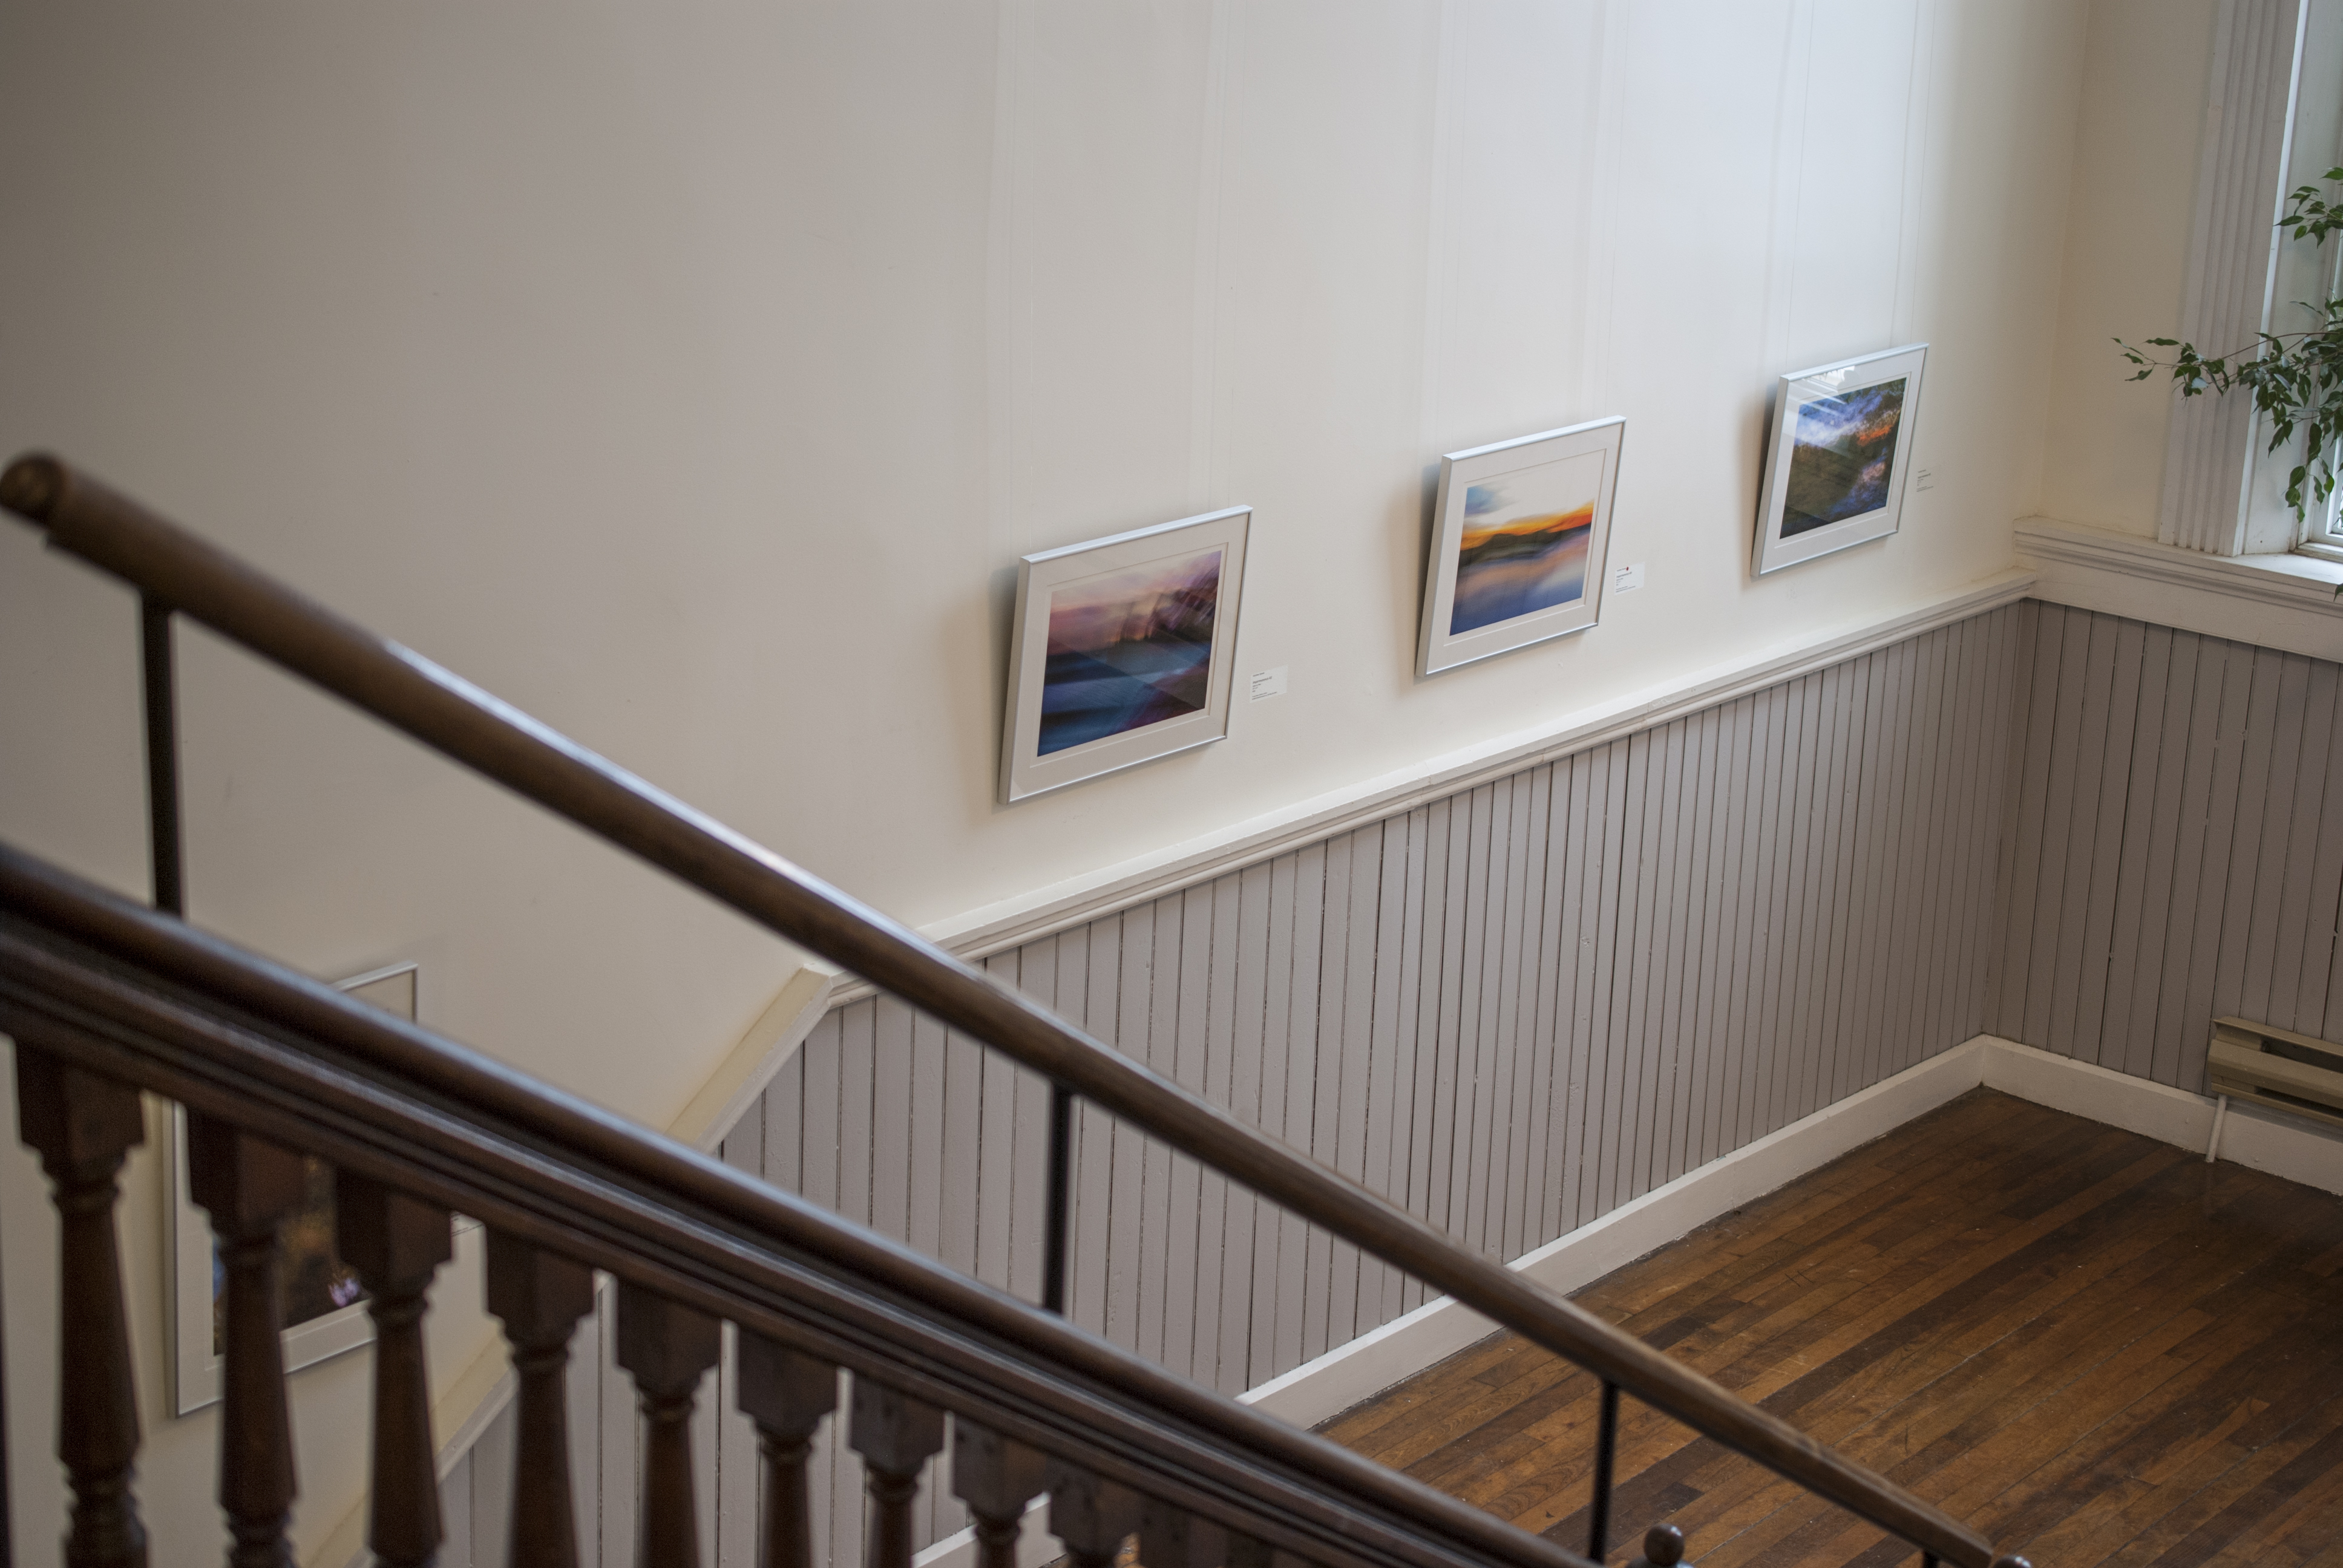 Charlotte Glencross Gallery • Charlotte Street Arts Centre • February 24 to April 10, 2017